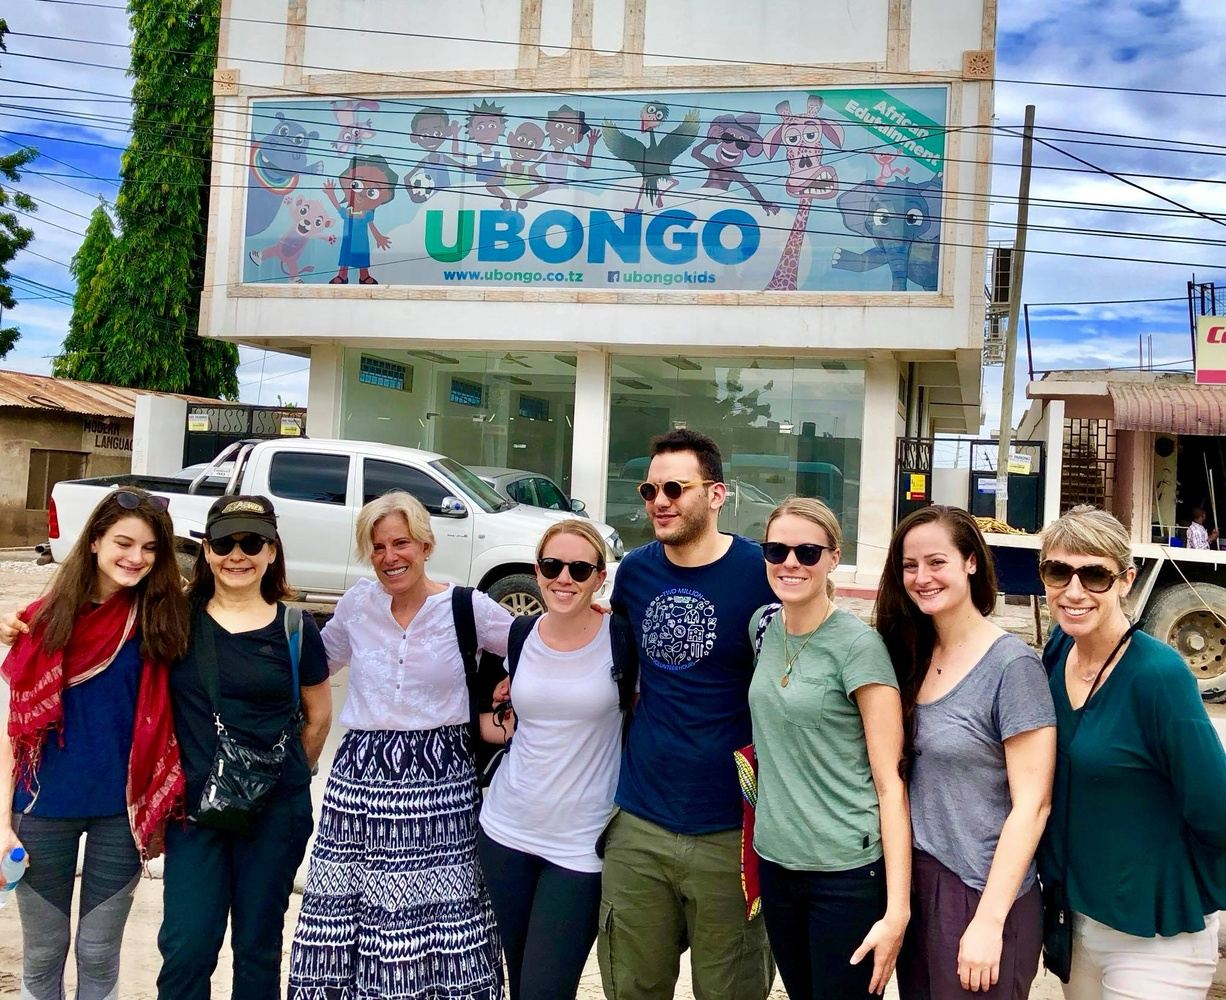 Global Leadership Trip: Tanzania 2021 (SAMPLE)